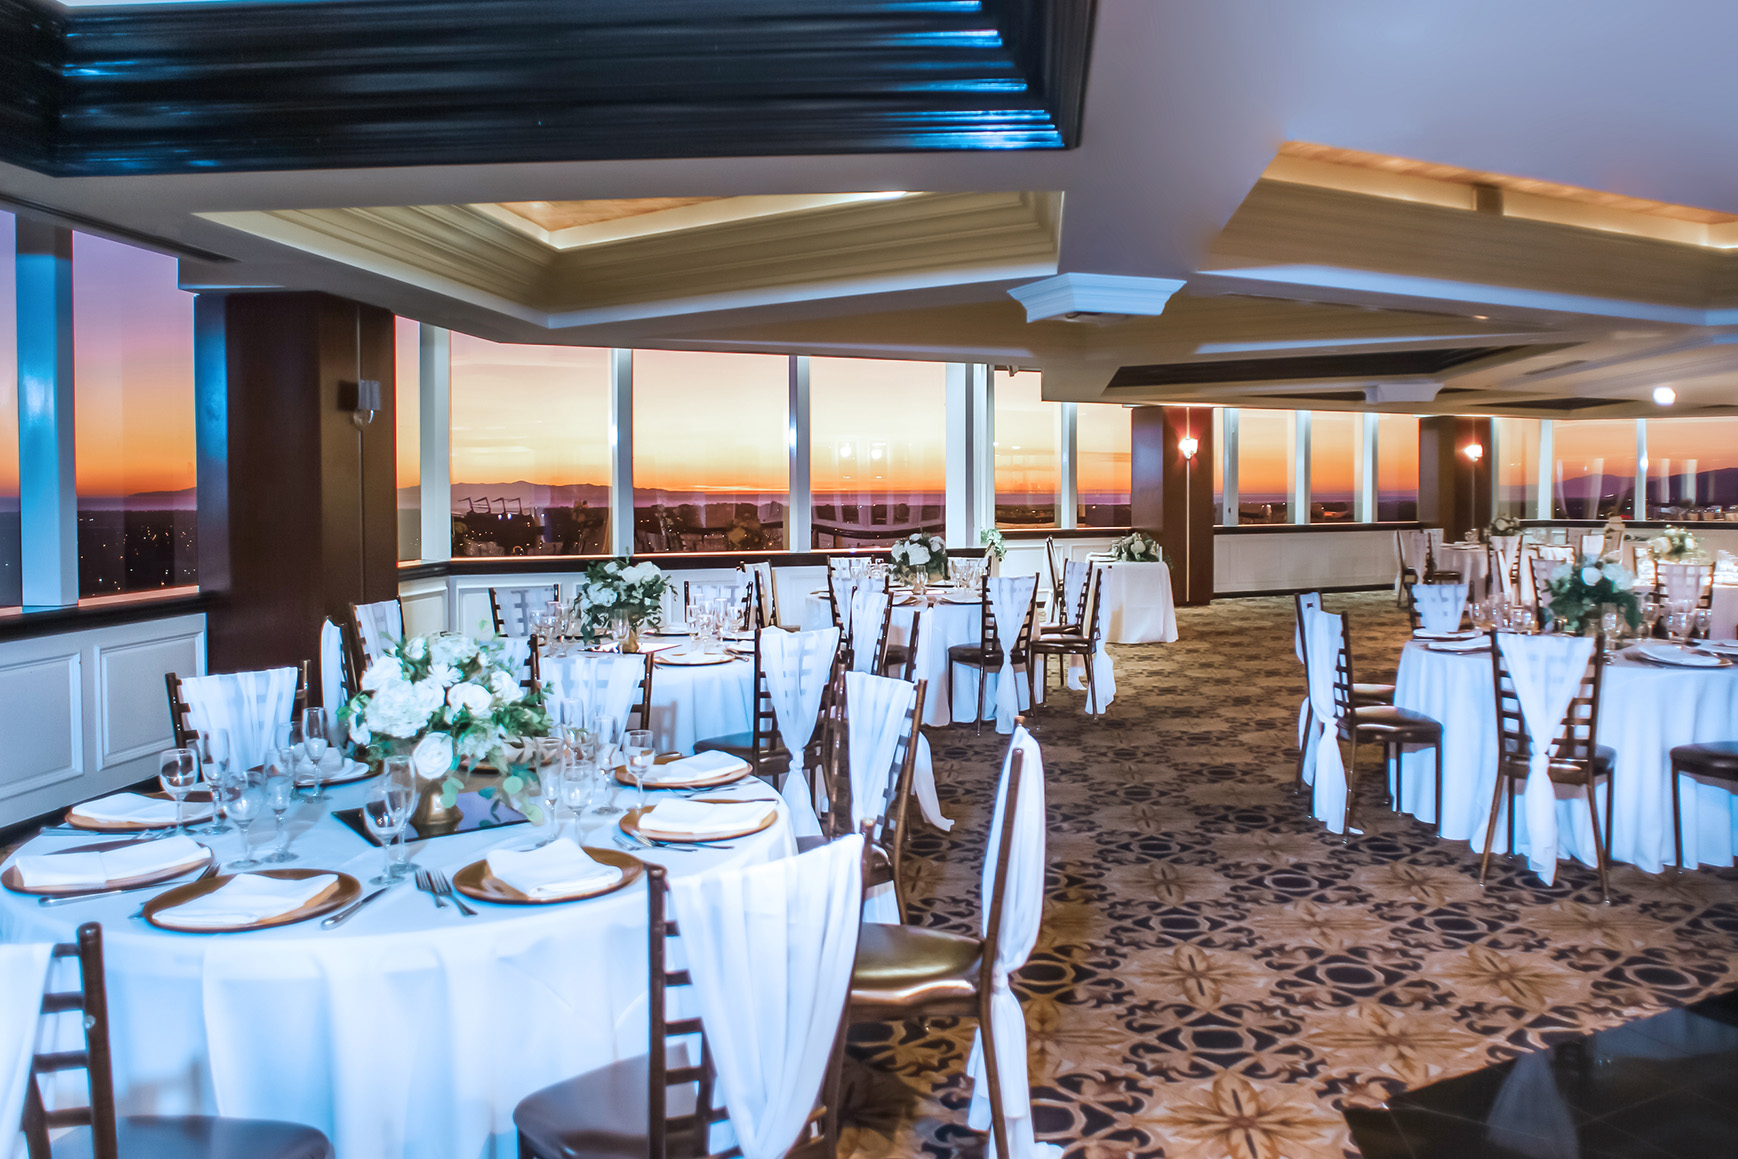 Pacific View Tower Club - Oxnard, California - Ventura County - Bride and Groom - Wedgewood Weddings